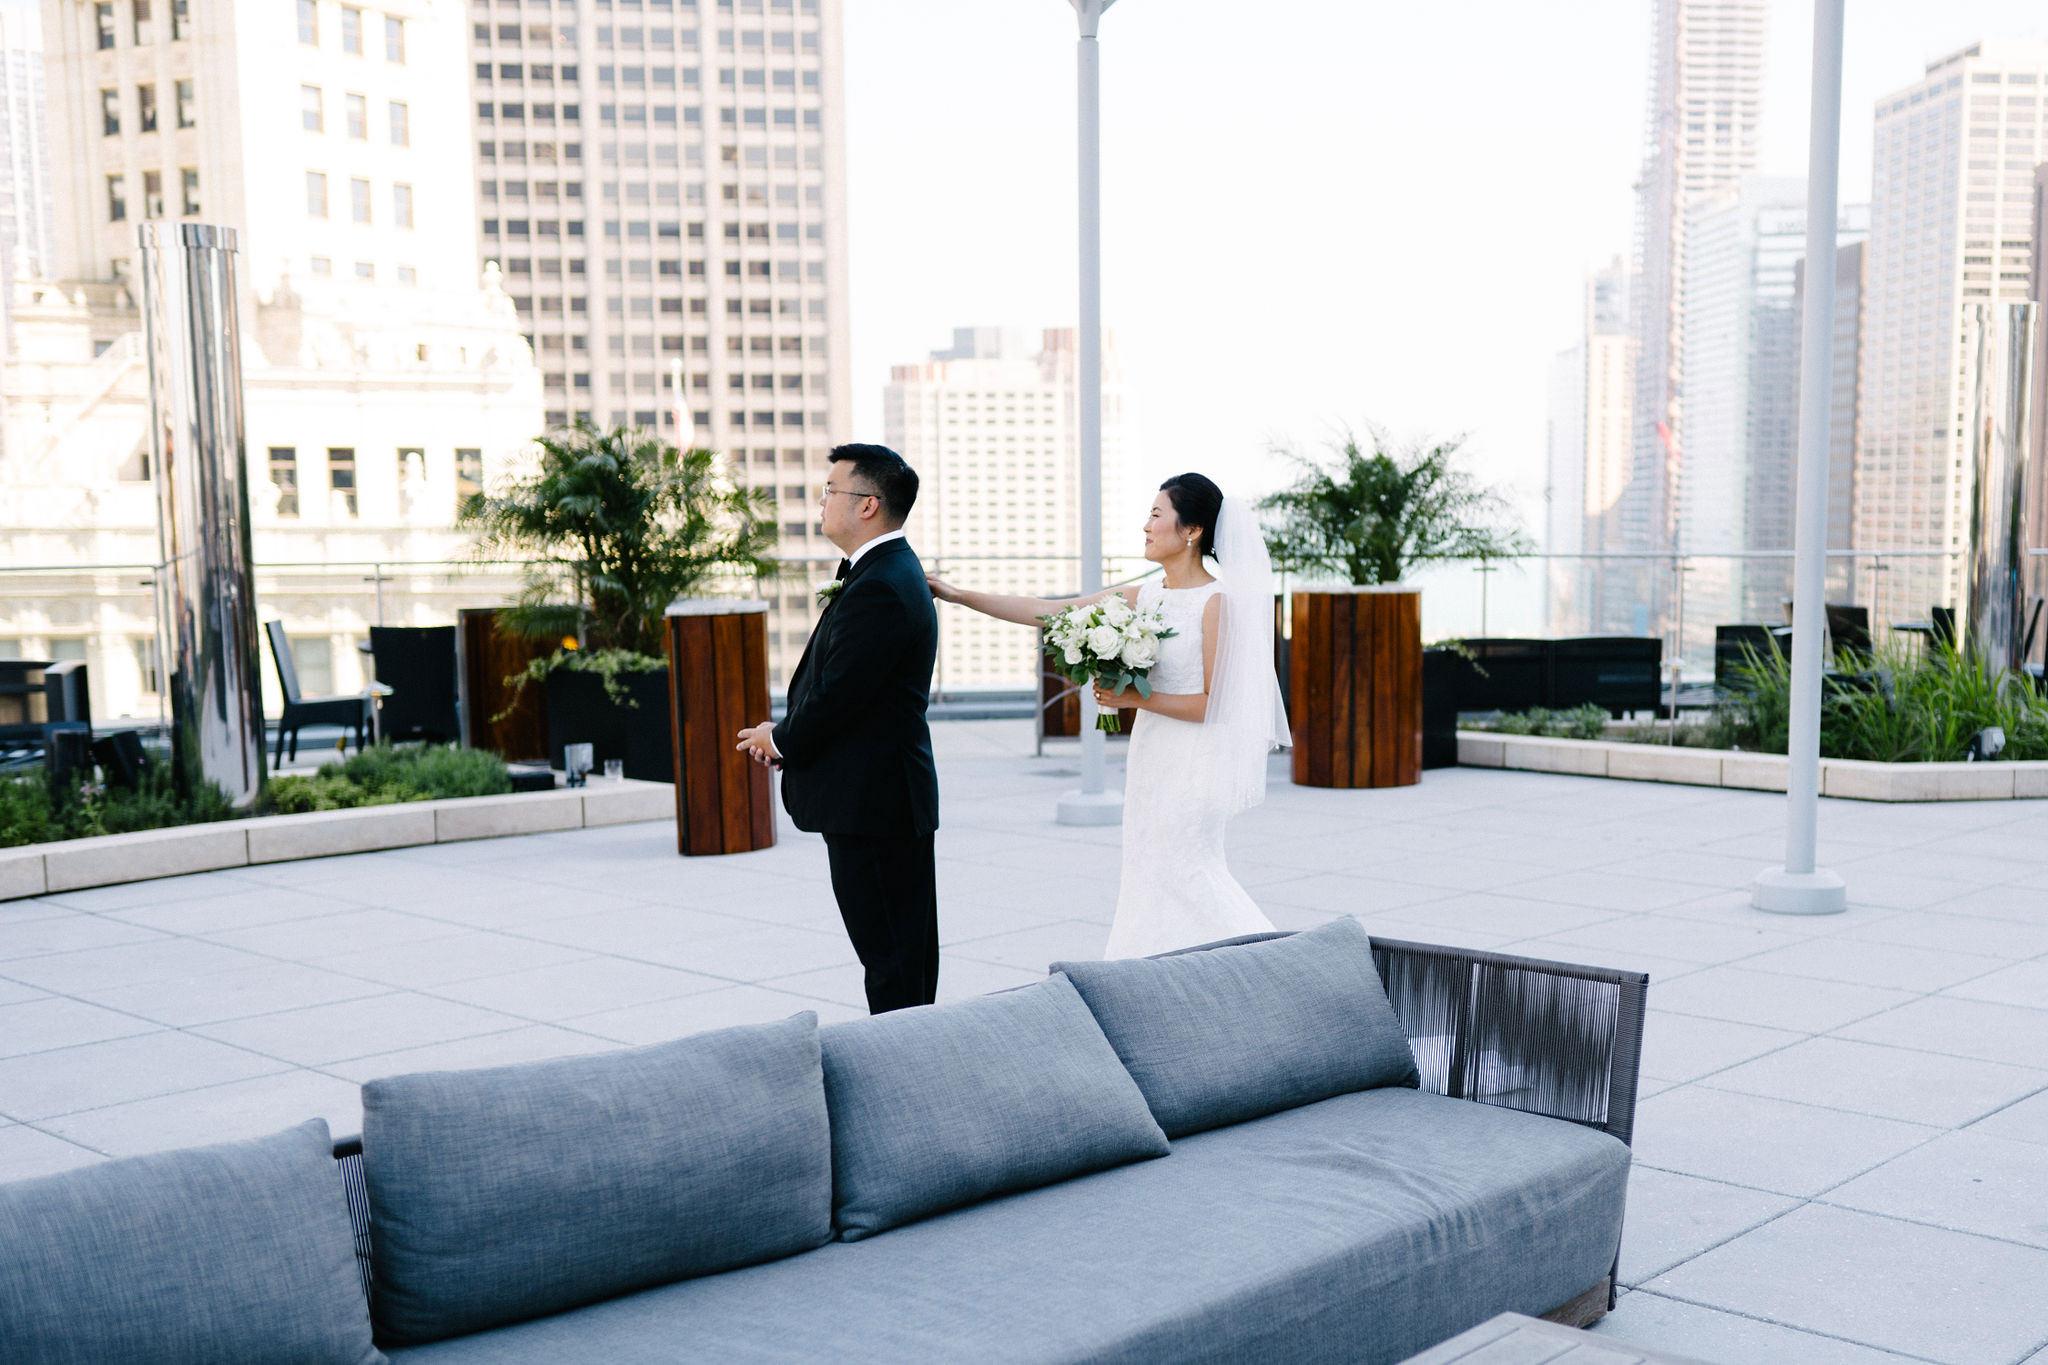 008-rempel-photography-chicago-wedding-inspiration-sara-philip-rockefeller-chapel-trump-tower.jpg